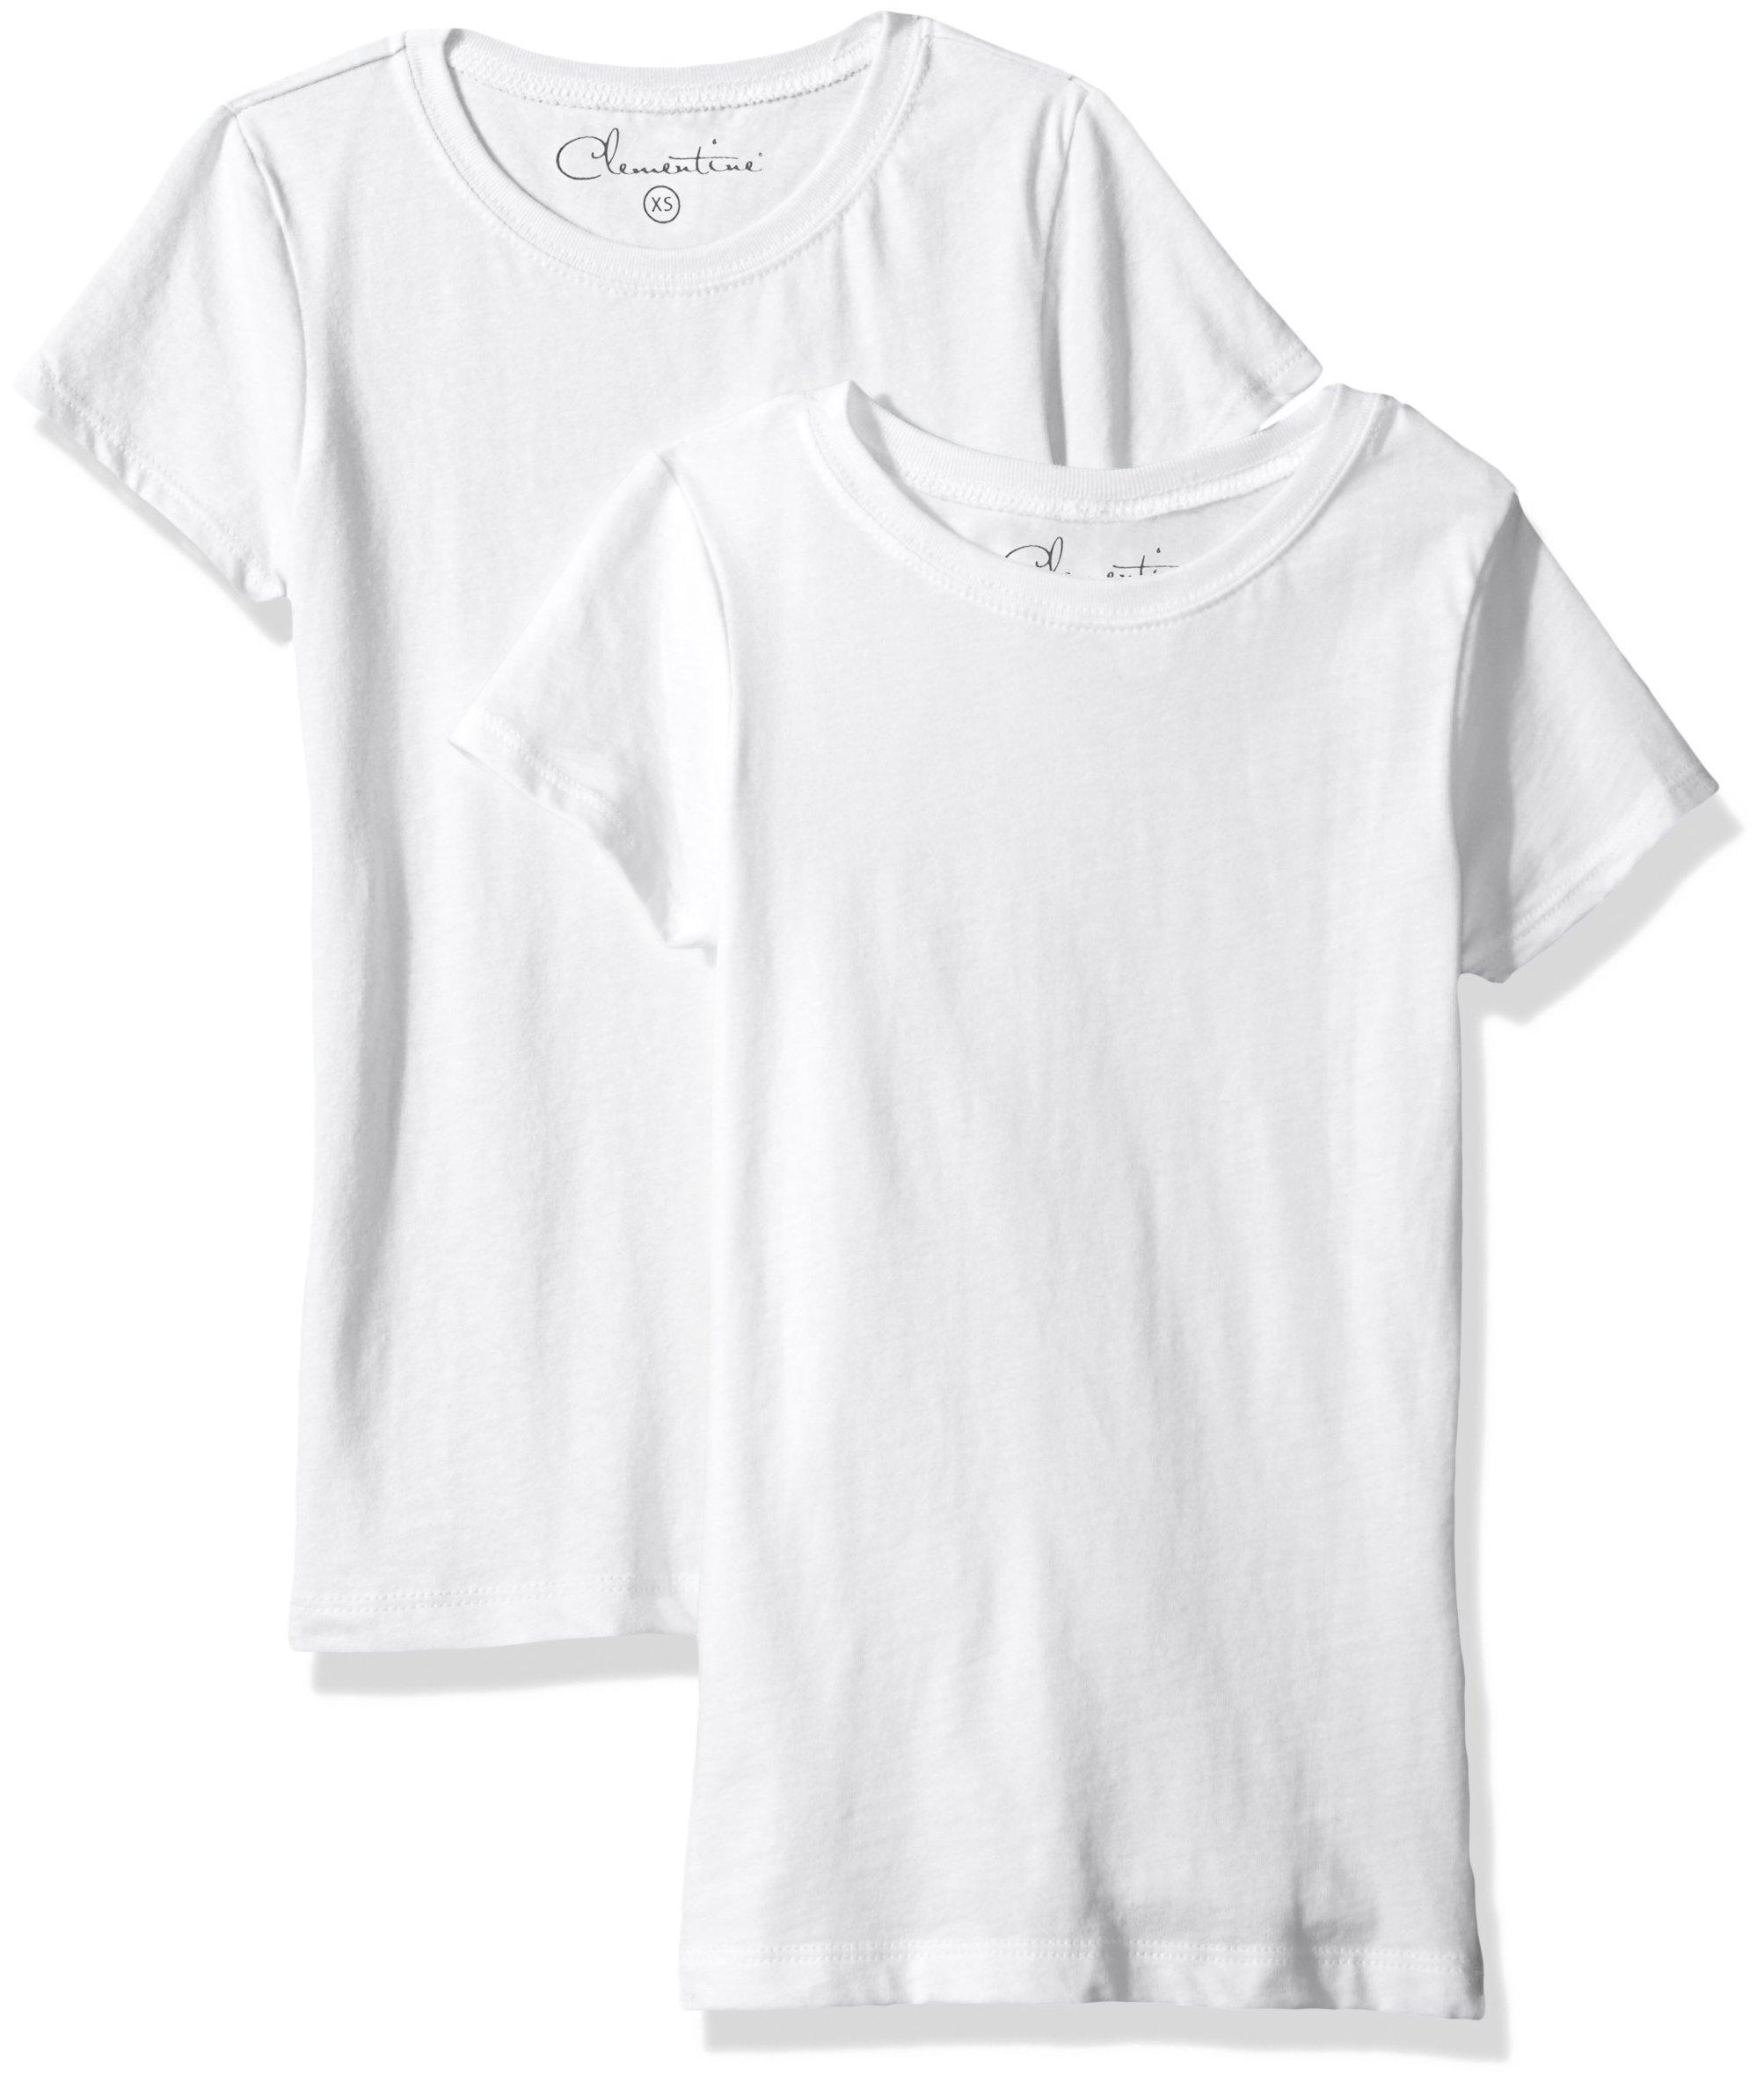 Clementine Big Girls' Everyday T-Shirts Crew 2-Pack, White/White, L